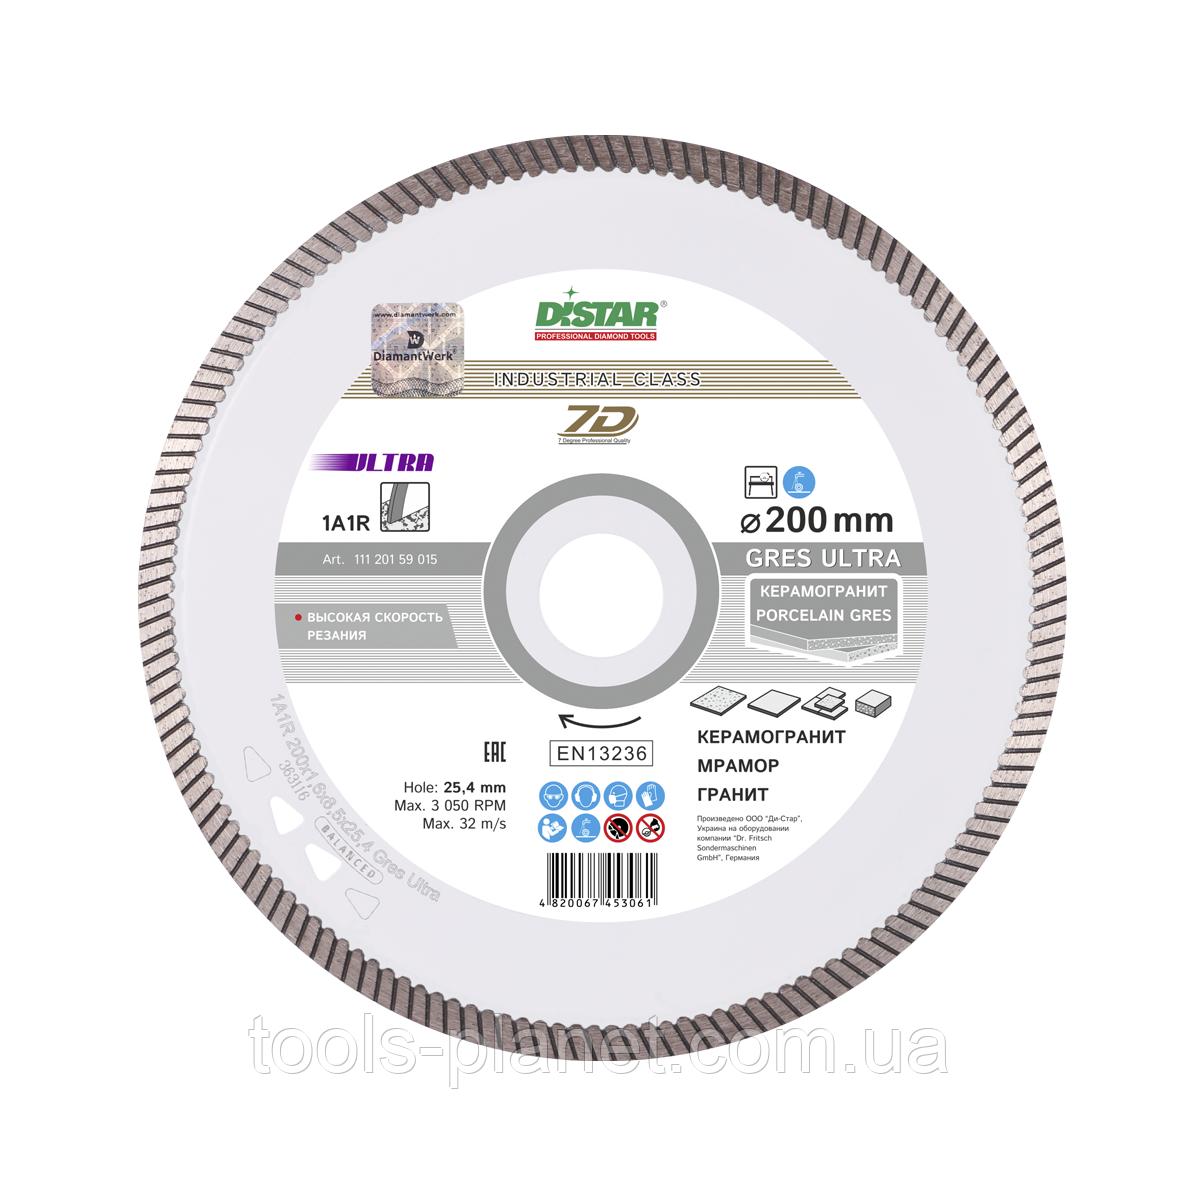 Алмазный диск Distar 1A1R 200 x 1,6 x 10 x 25,4 Gres Ultra 7D (11120159015)